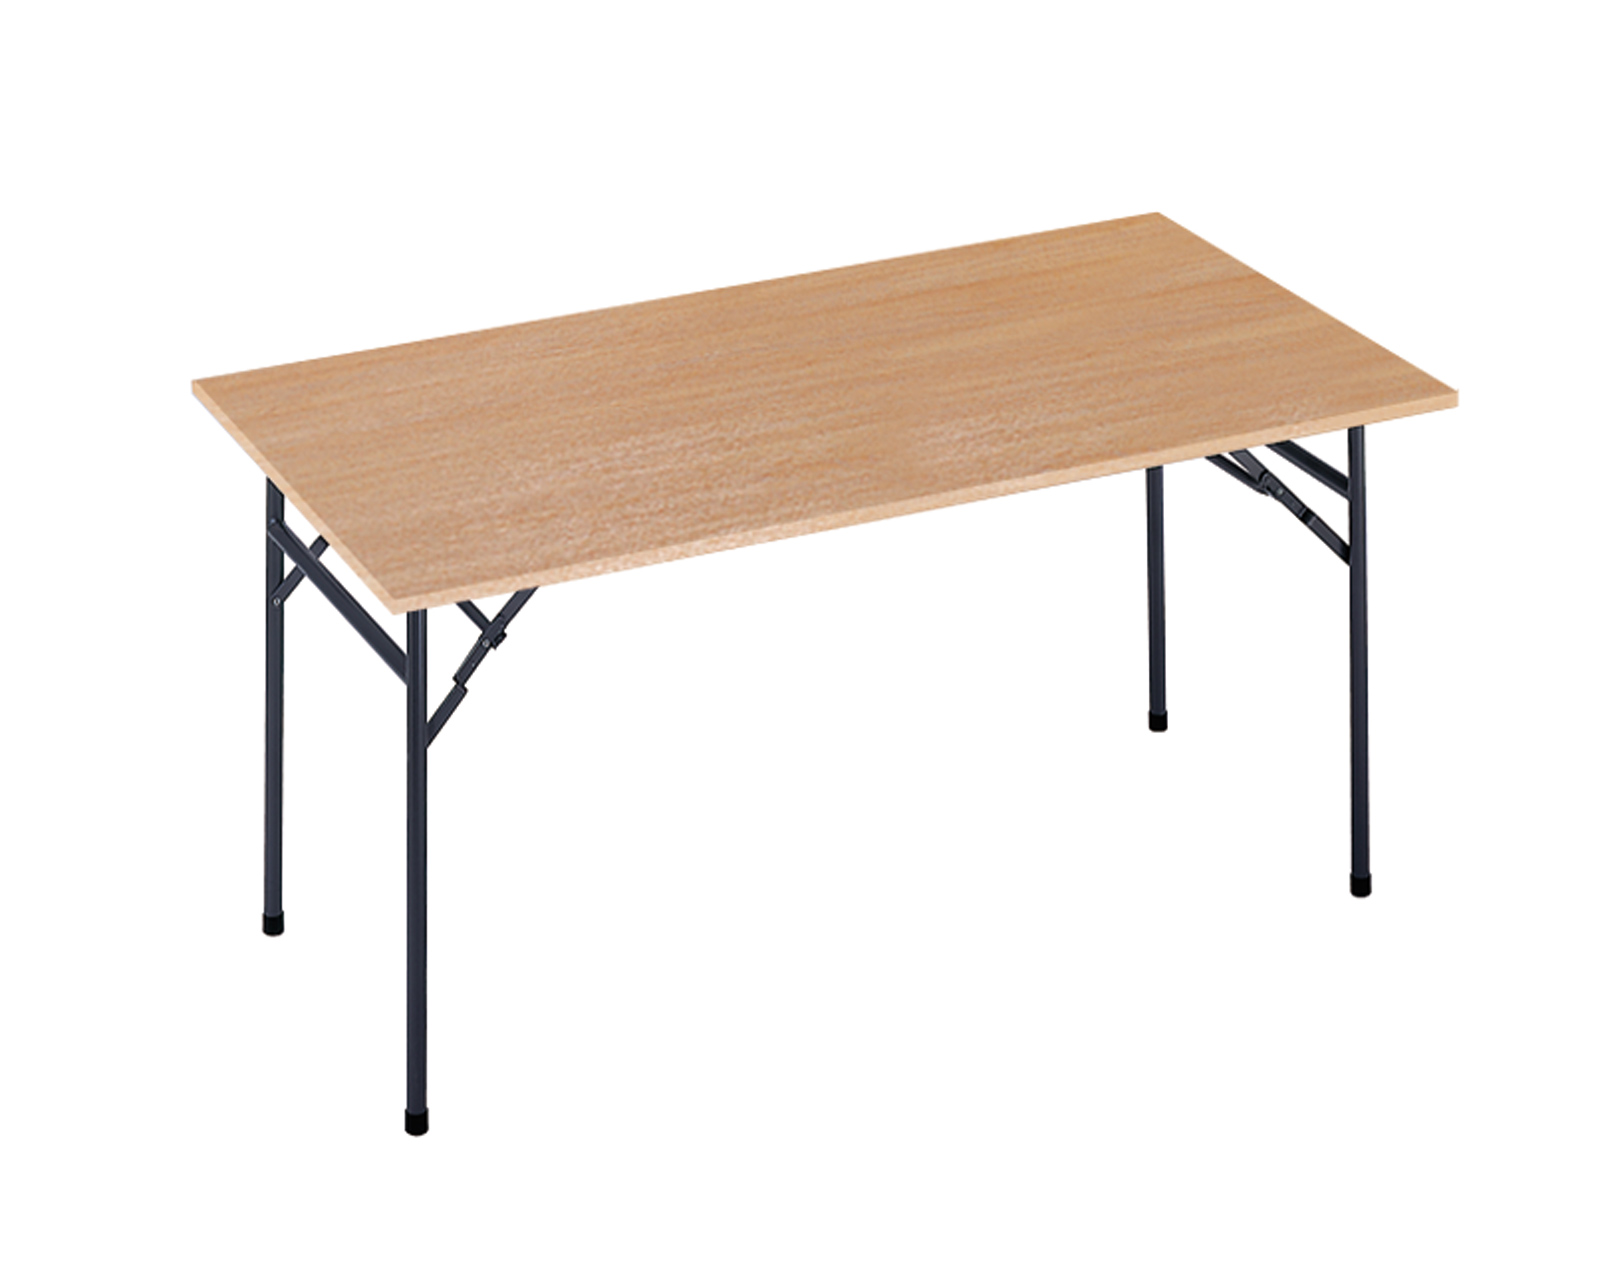 Verona Folding Leg Rectangular Table 1524x746mm Beech